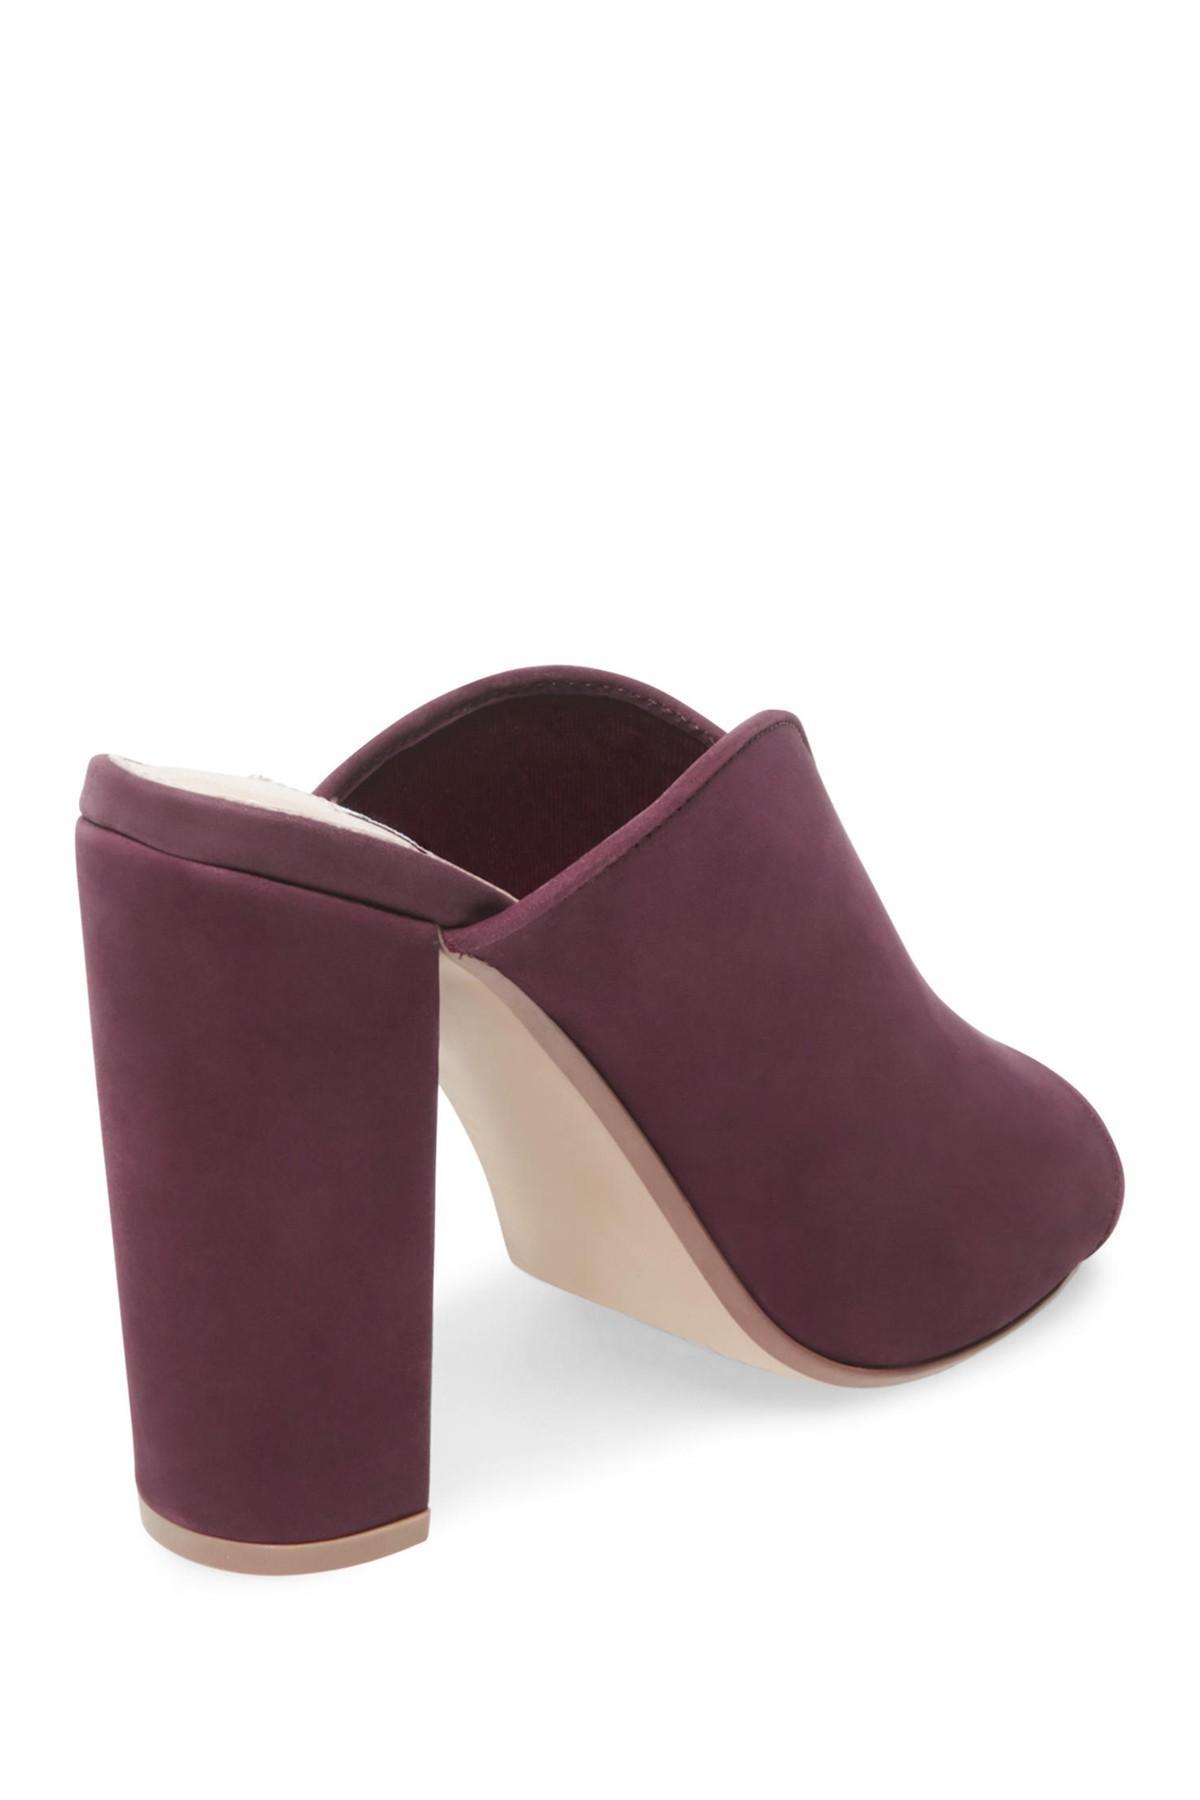 531a8fd782e Steve Madden Purple Vista Open Toe Block Heel Mule